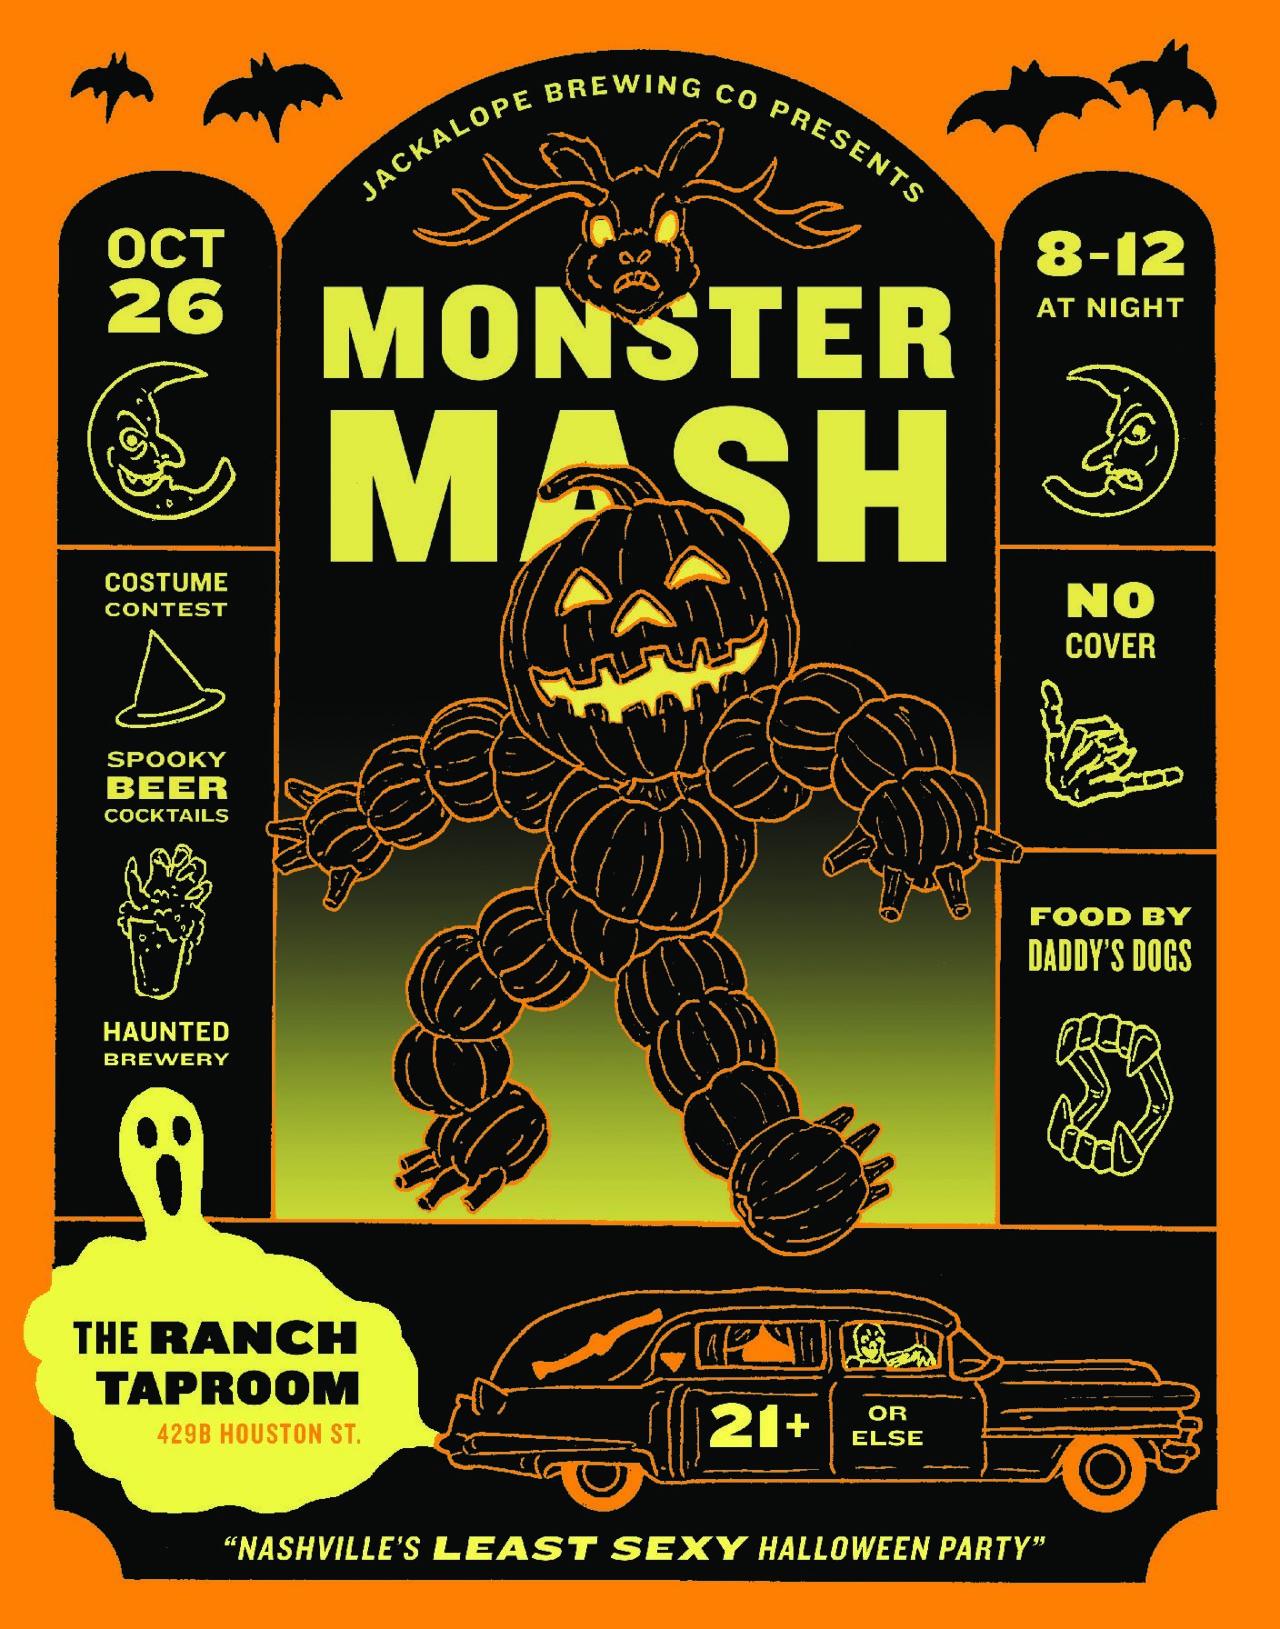 https://jackalopebrew.com/wp-content/uploads/2019/09/Monster-Mash-Poster-pdf-1280x1629.jpg